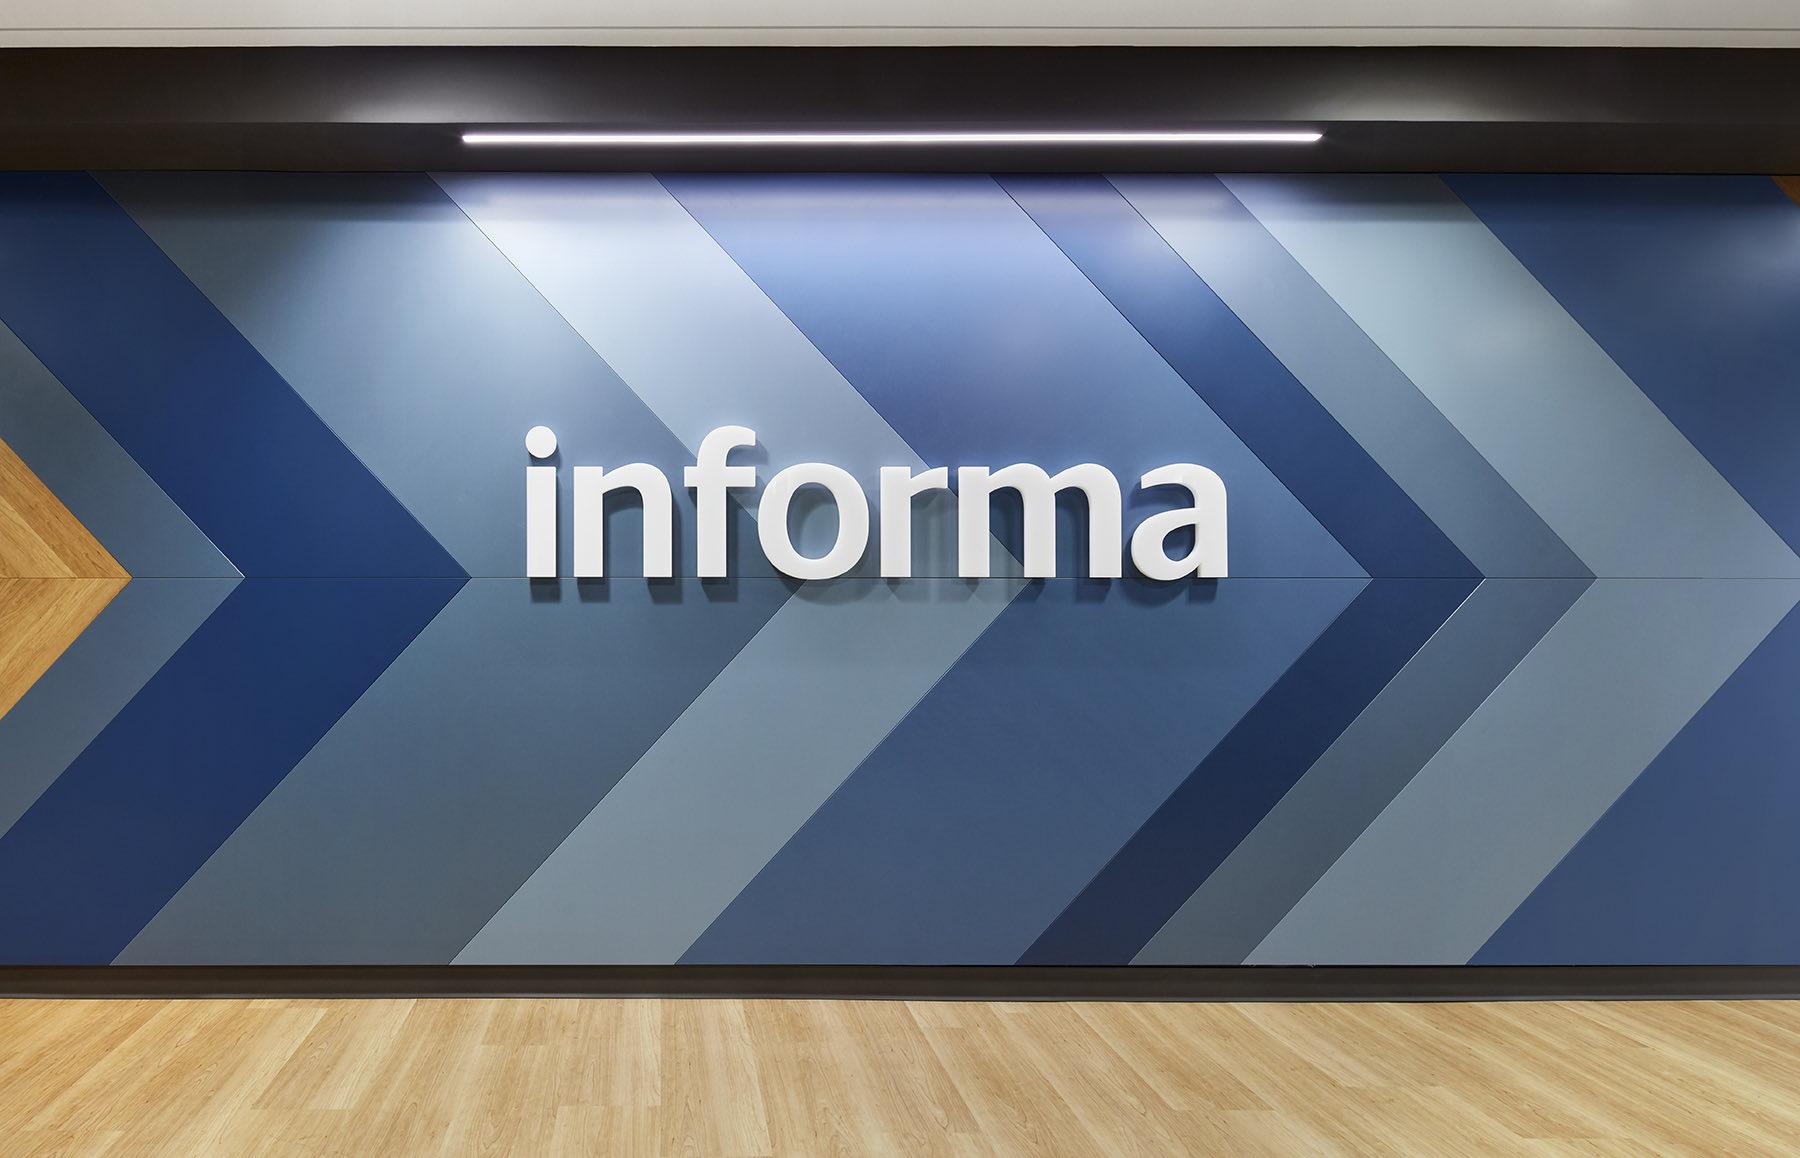 informa-toronto-office-2